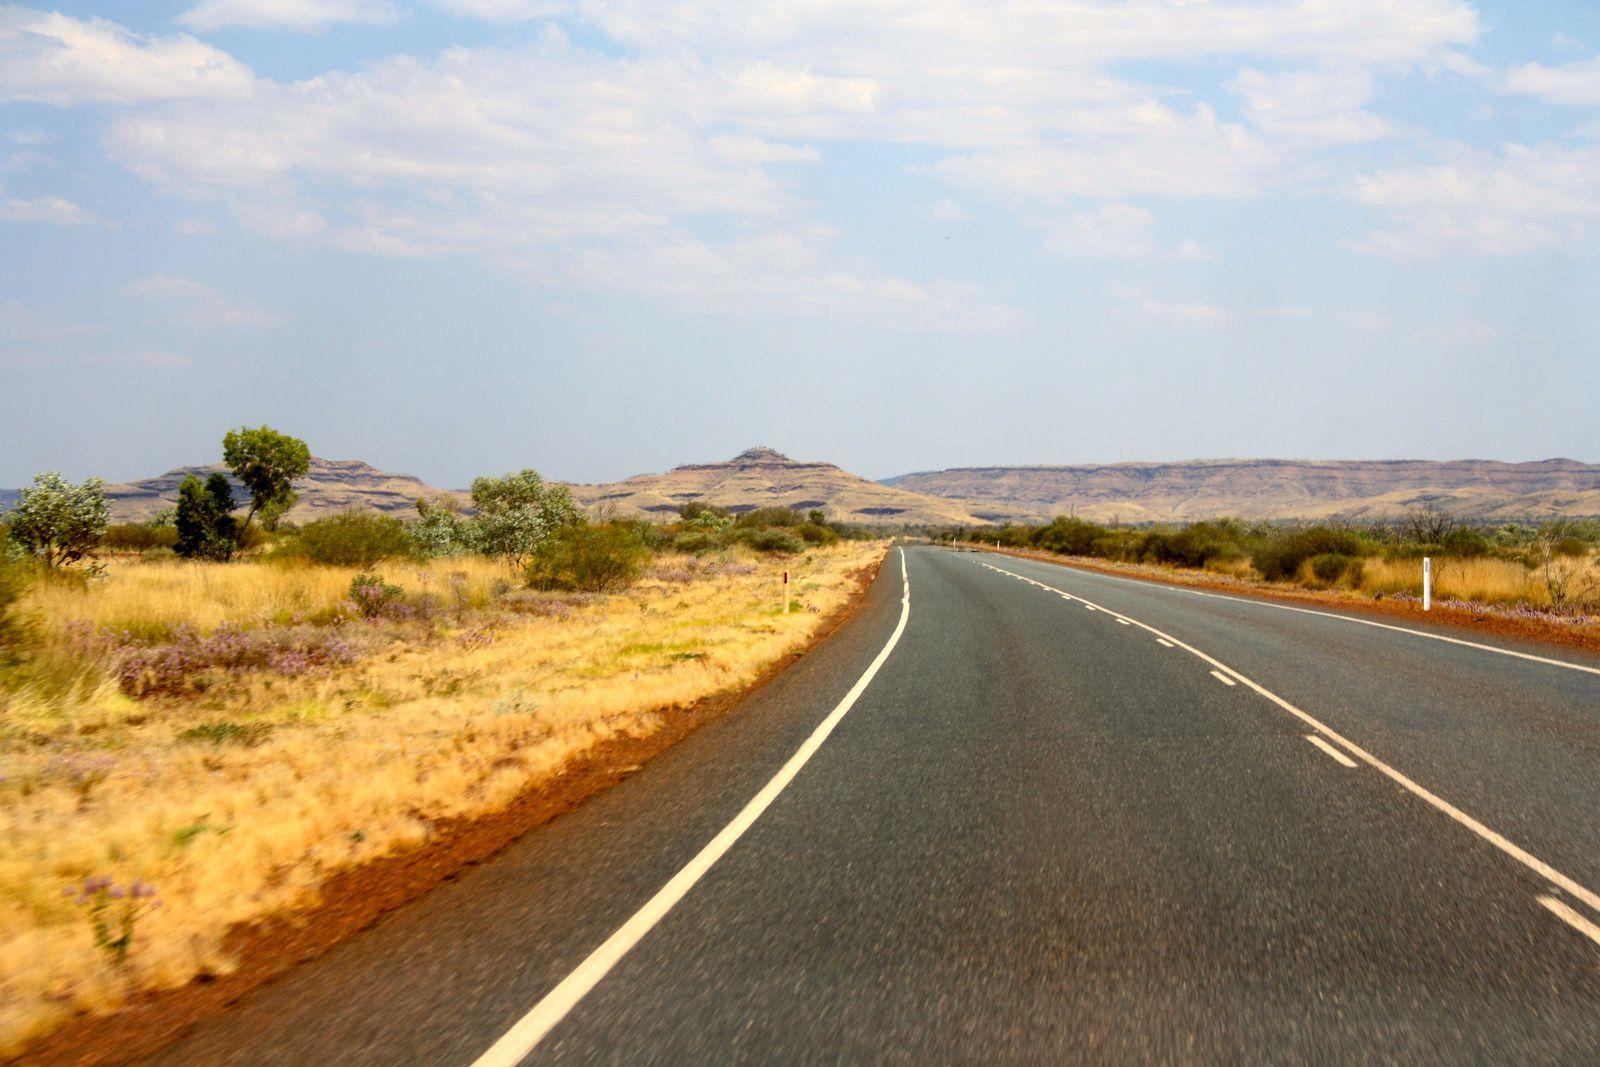 On the way to Karijini National Park